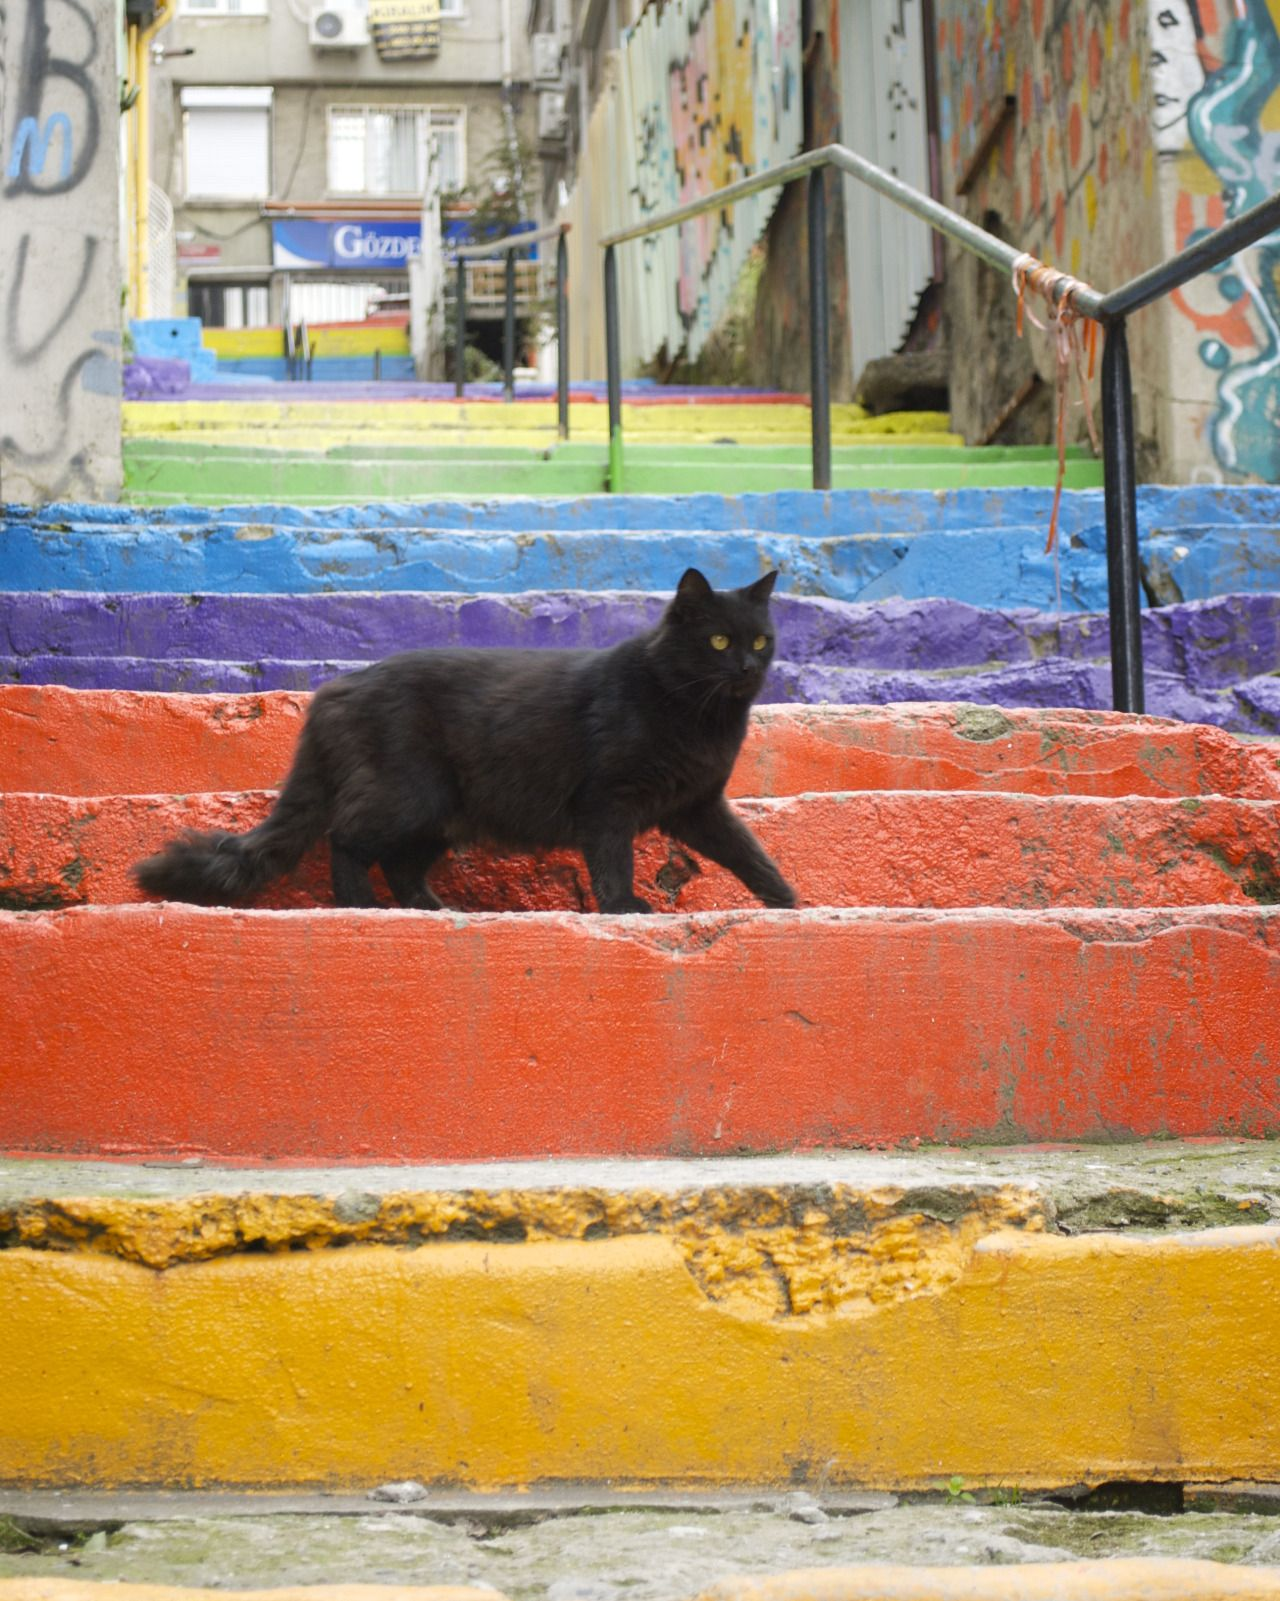 streetcatsistanbul: June 5th, 2015 - (Findikli)For more photos of Istanbul's street cats daily at StreetCatsIstanbul!